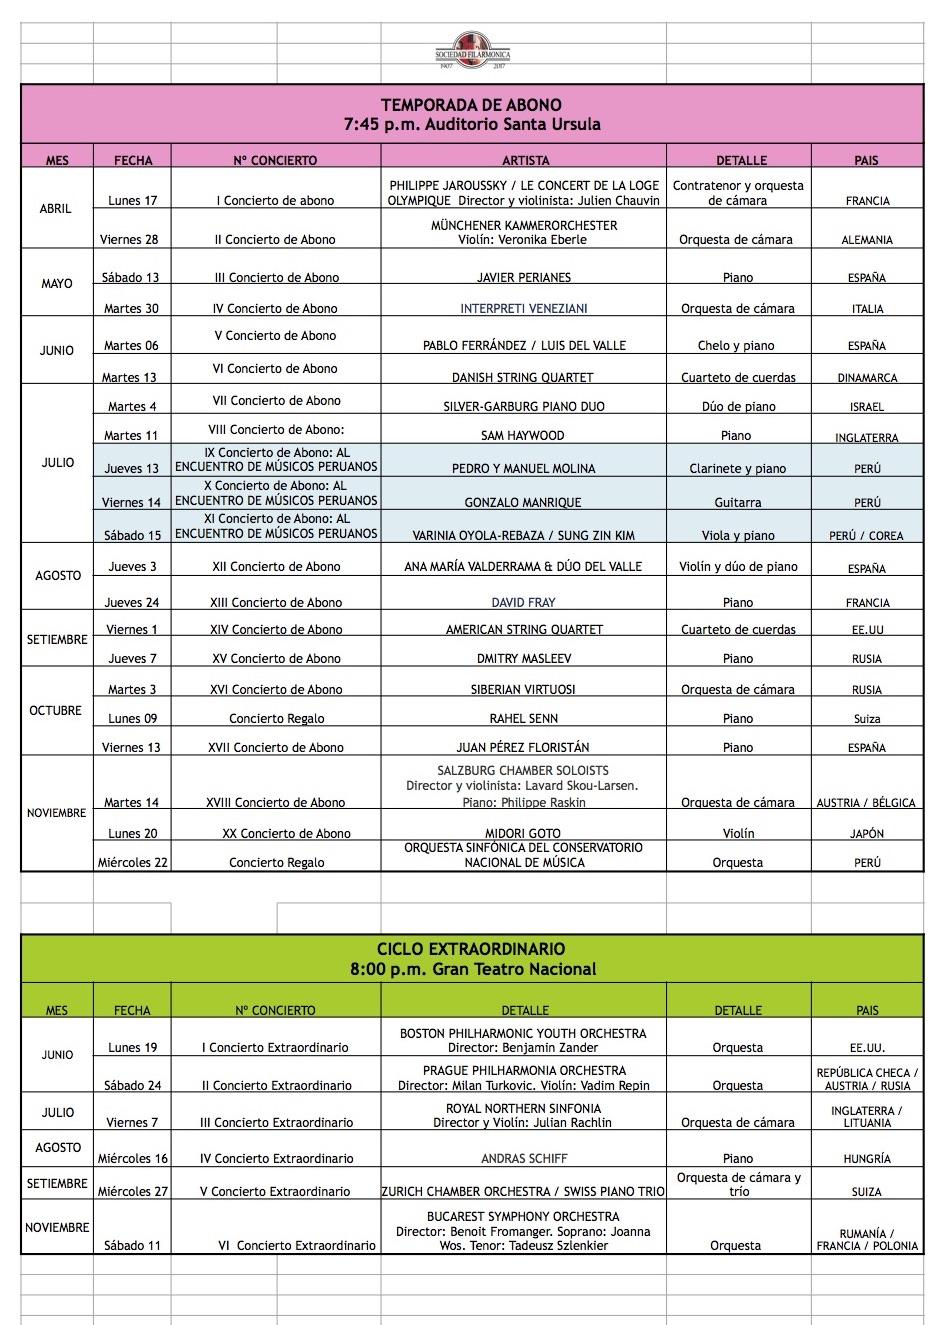 Programa Temporada 2017 con vertical.xls.numbers-Hoja1